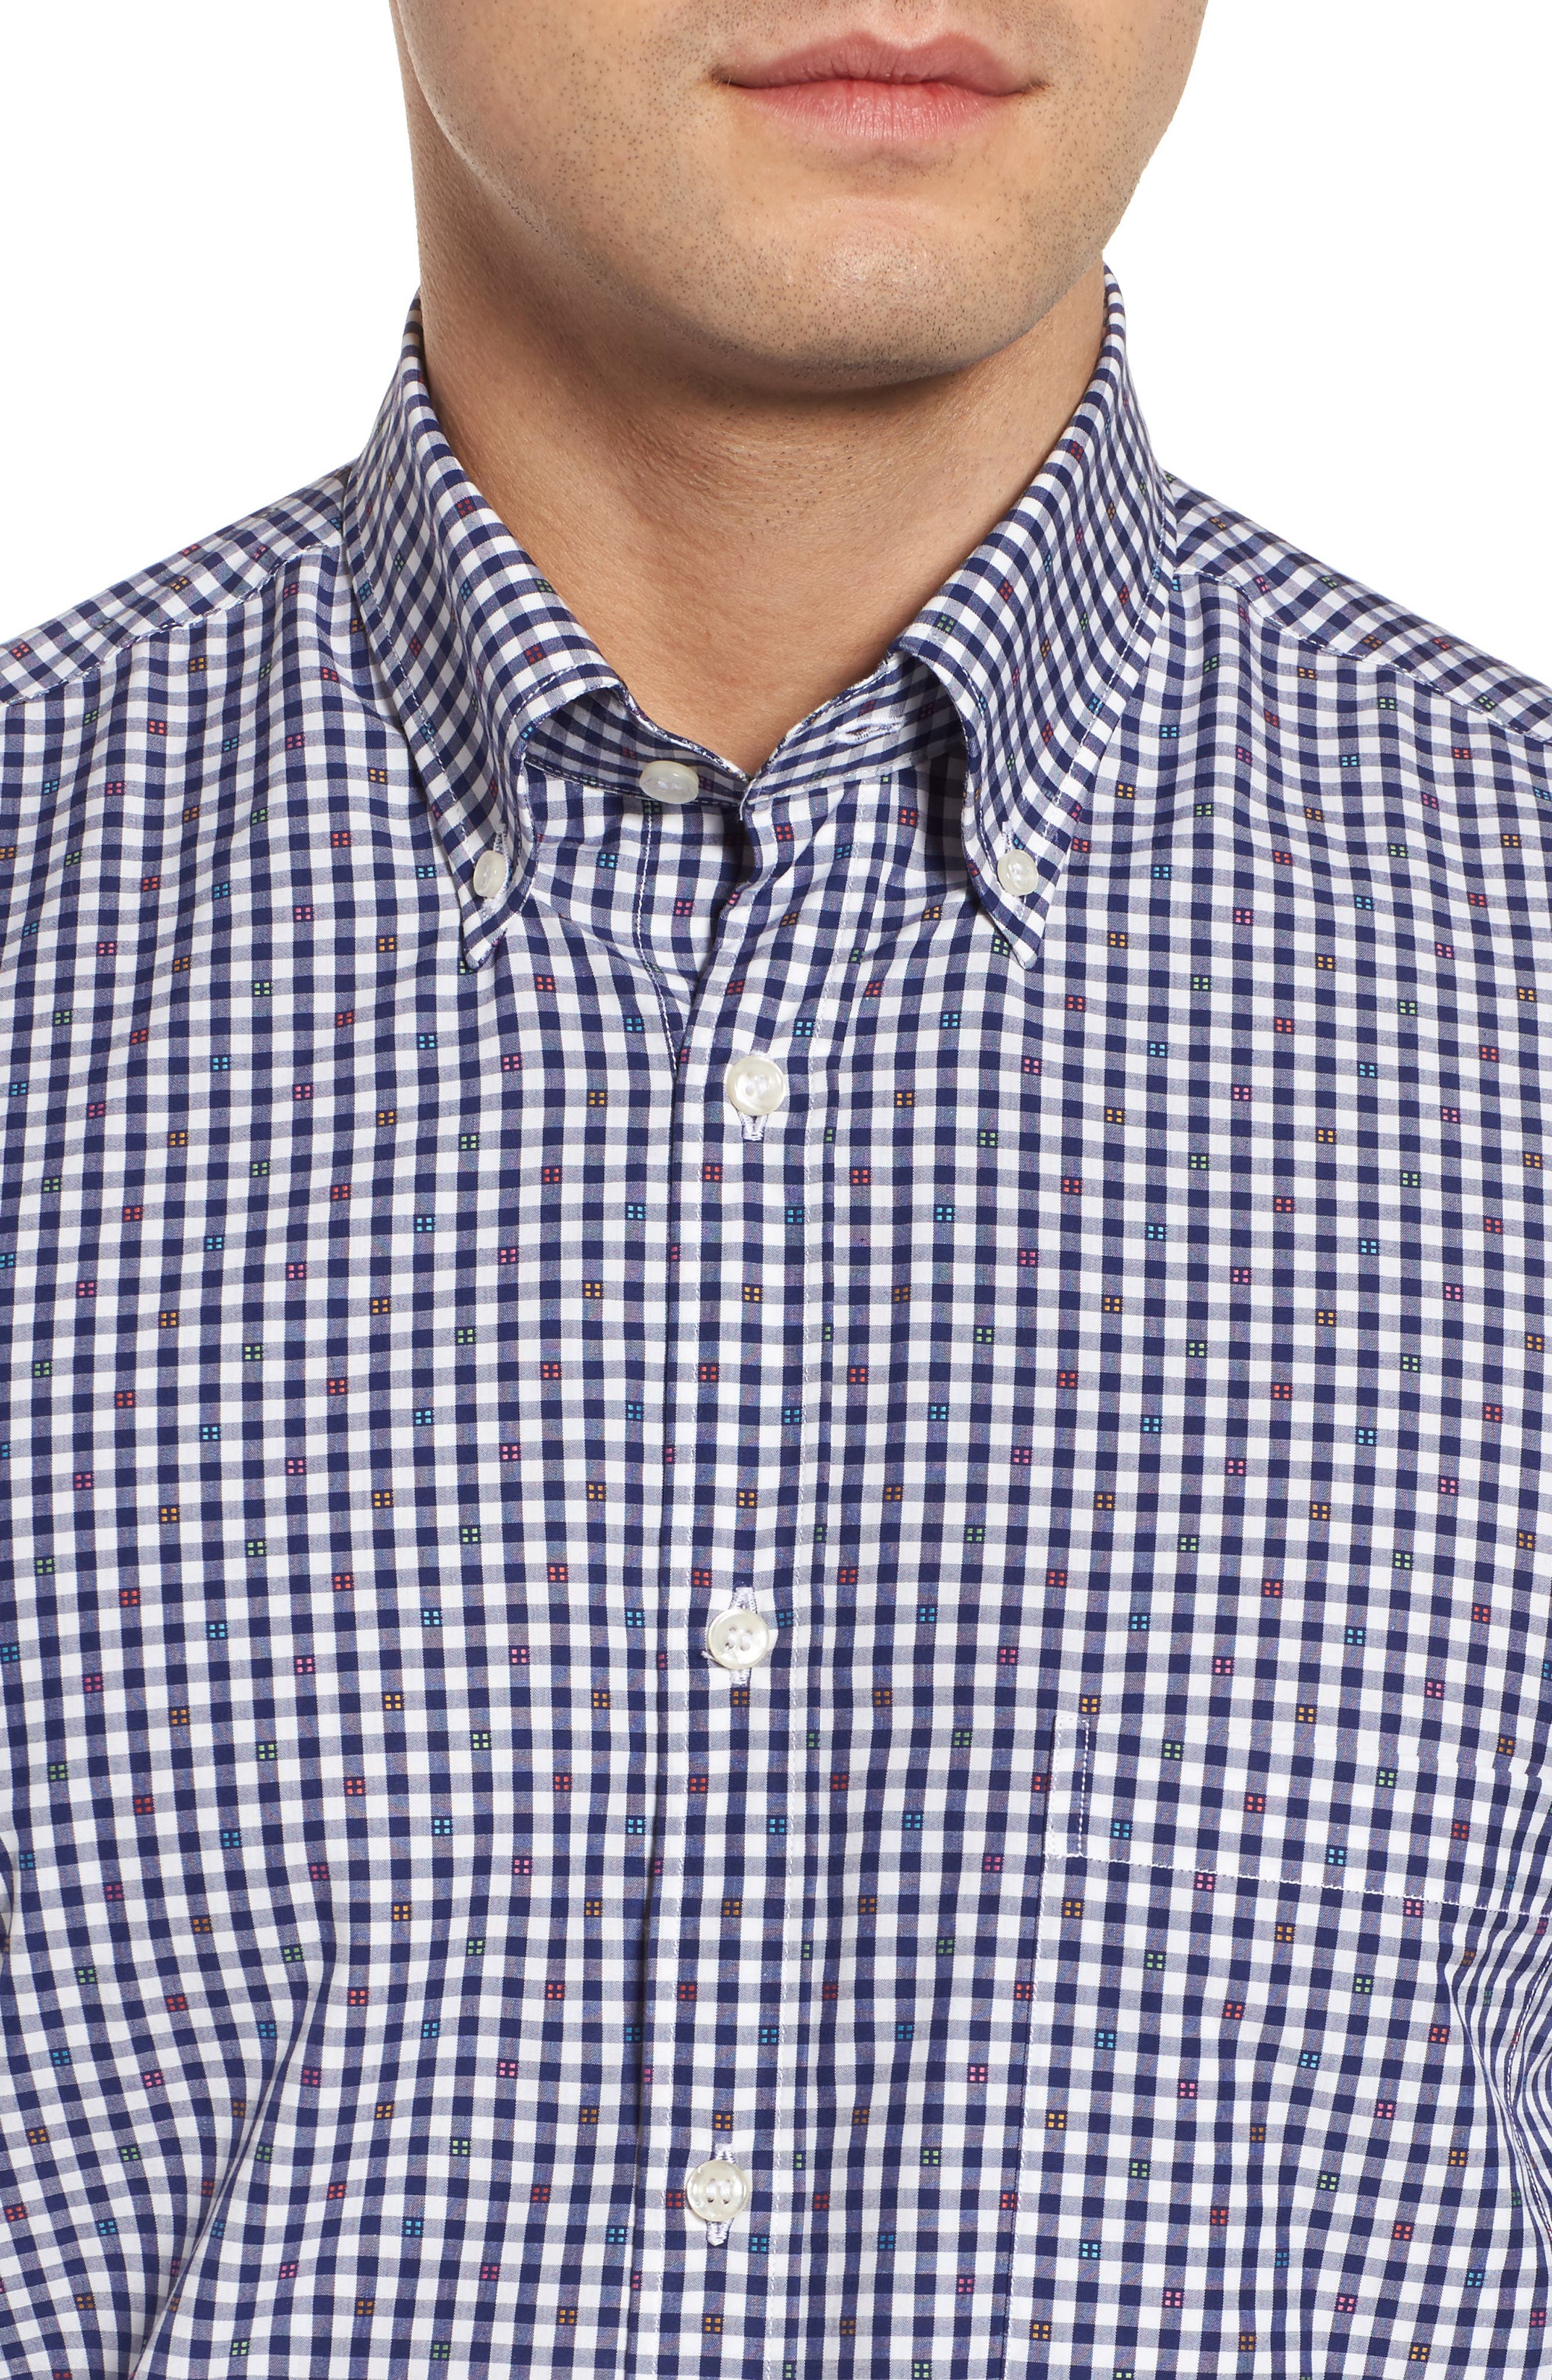 Paul&Shark Regular Fit Jacquard Check Sport Shirt,                             Alternate thumbnail 2, color,                             Navy/ White